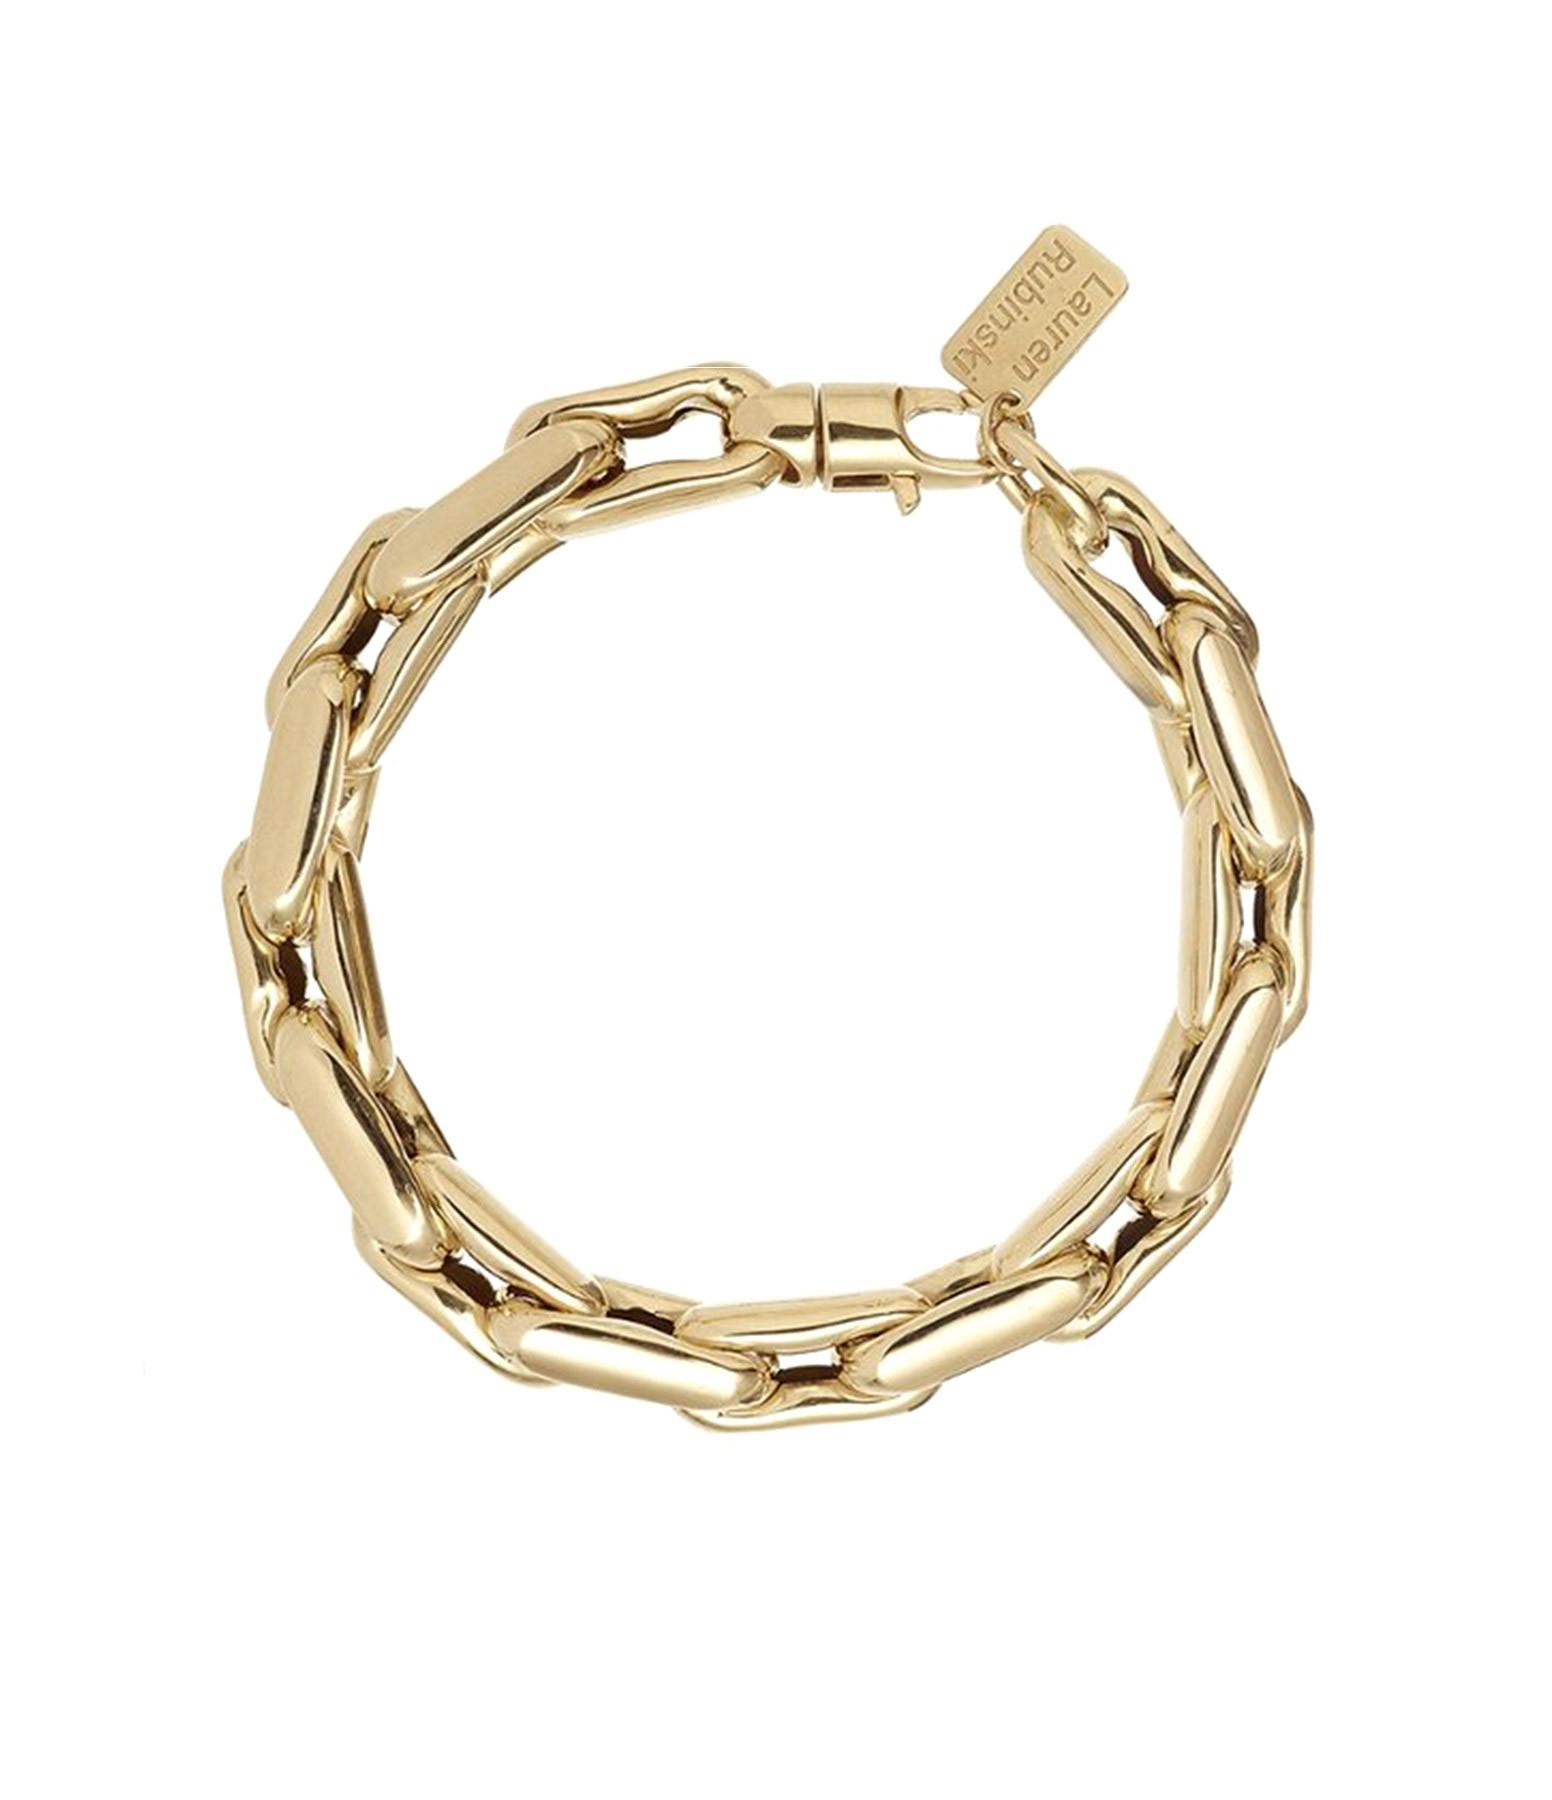 LAUREN RUBINSKI - Bracelet Medium 14 carats Or Jaune